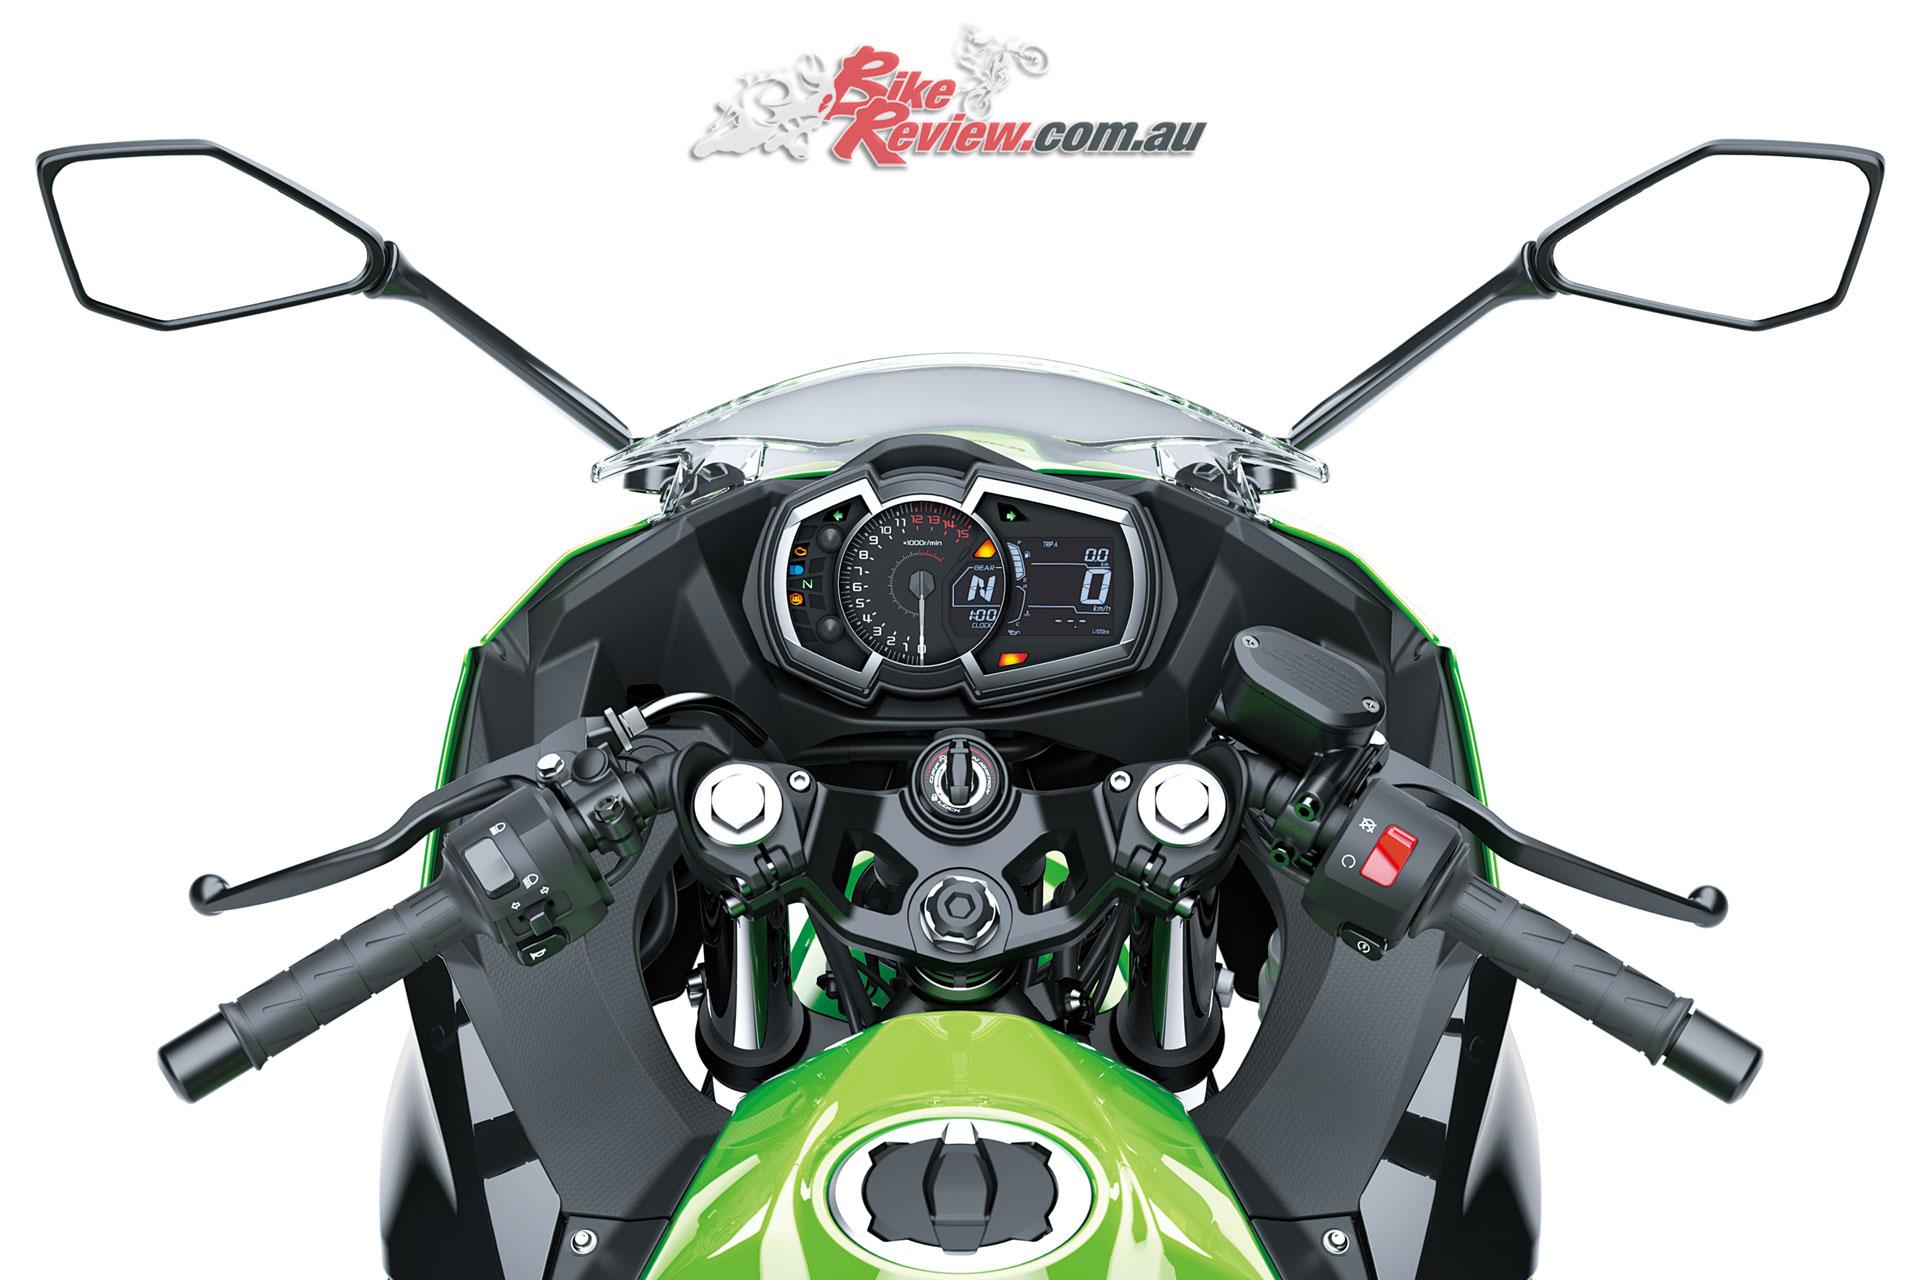 2018-Kawasaki-Ninja-400-LAMS-Bike-Review-EX400G-7